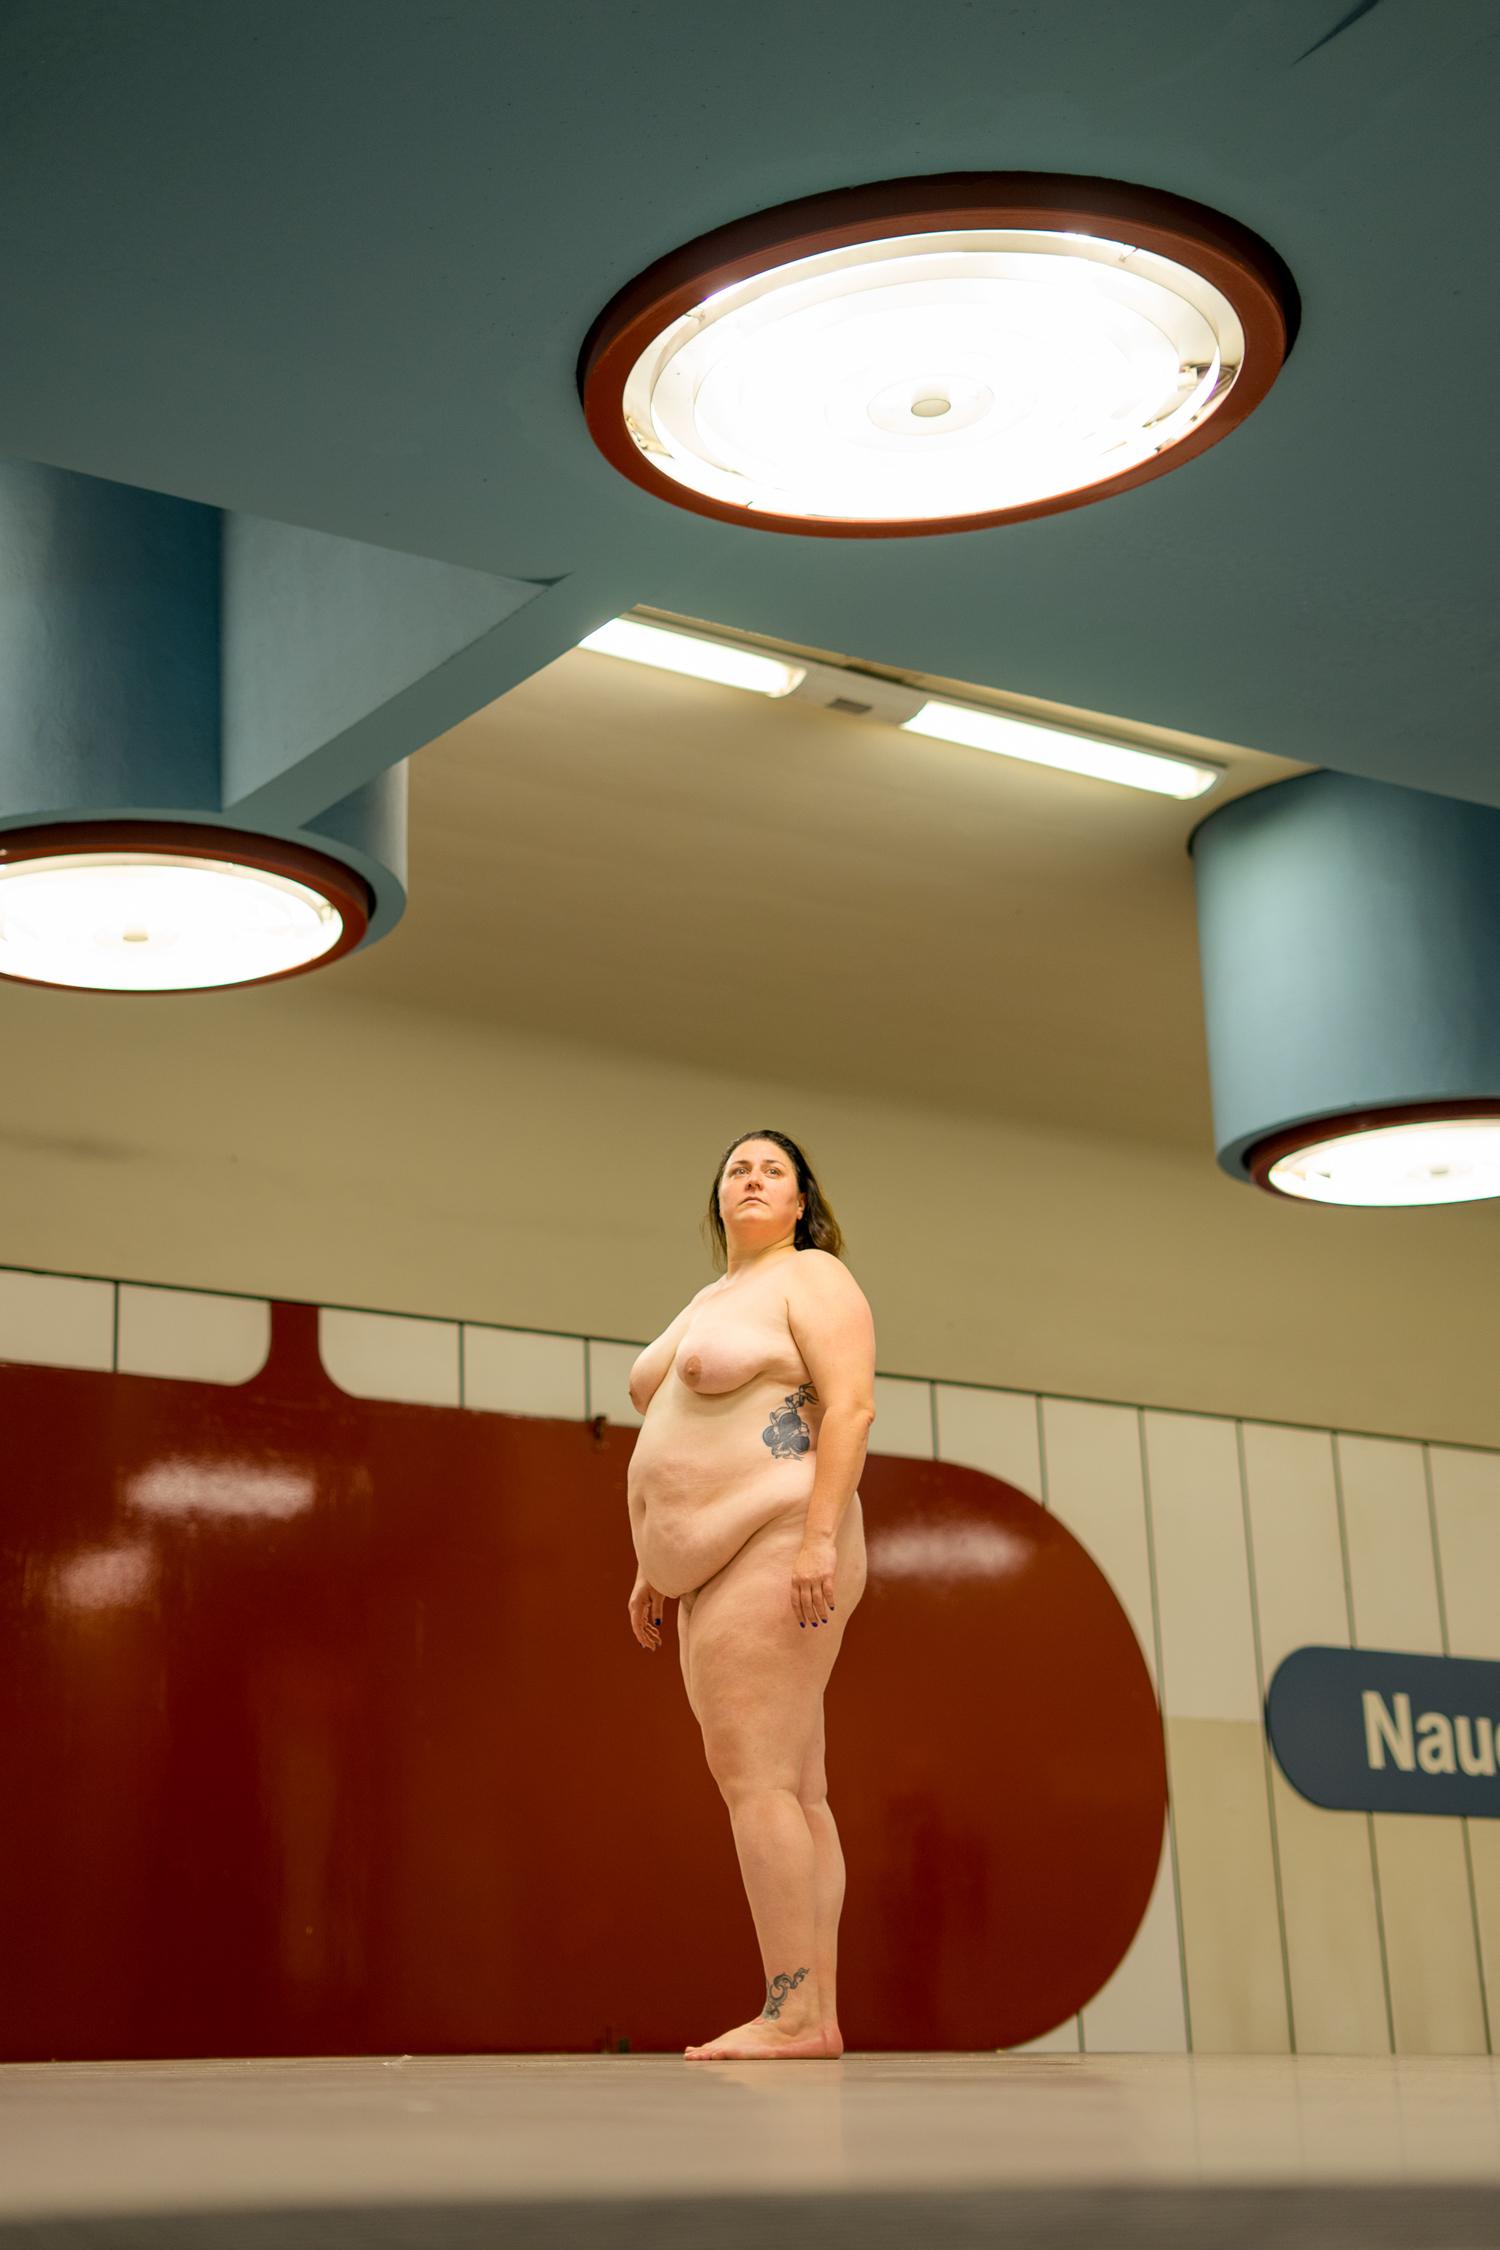 abdulsalam ajaj naked woman metro